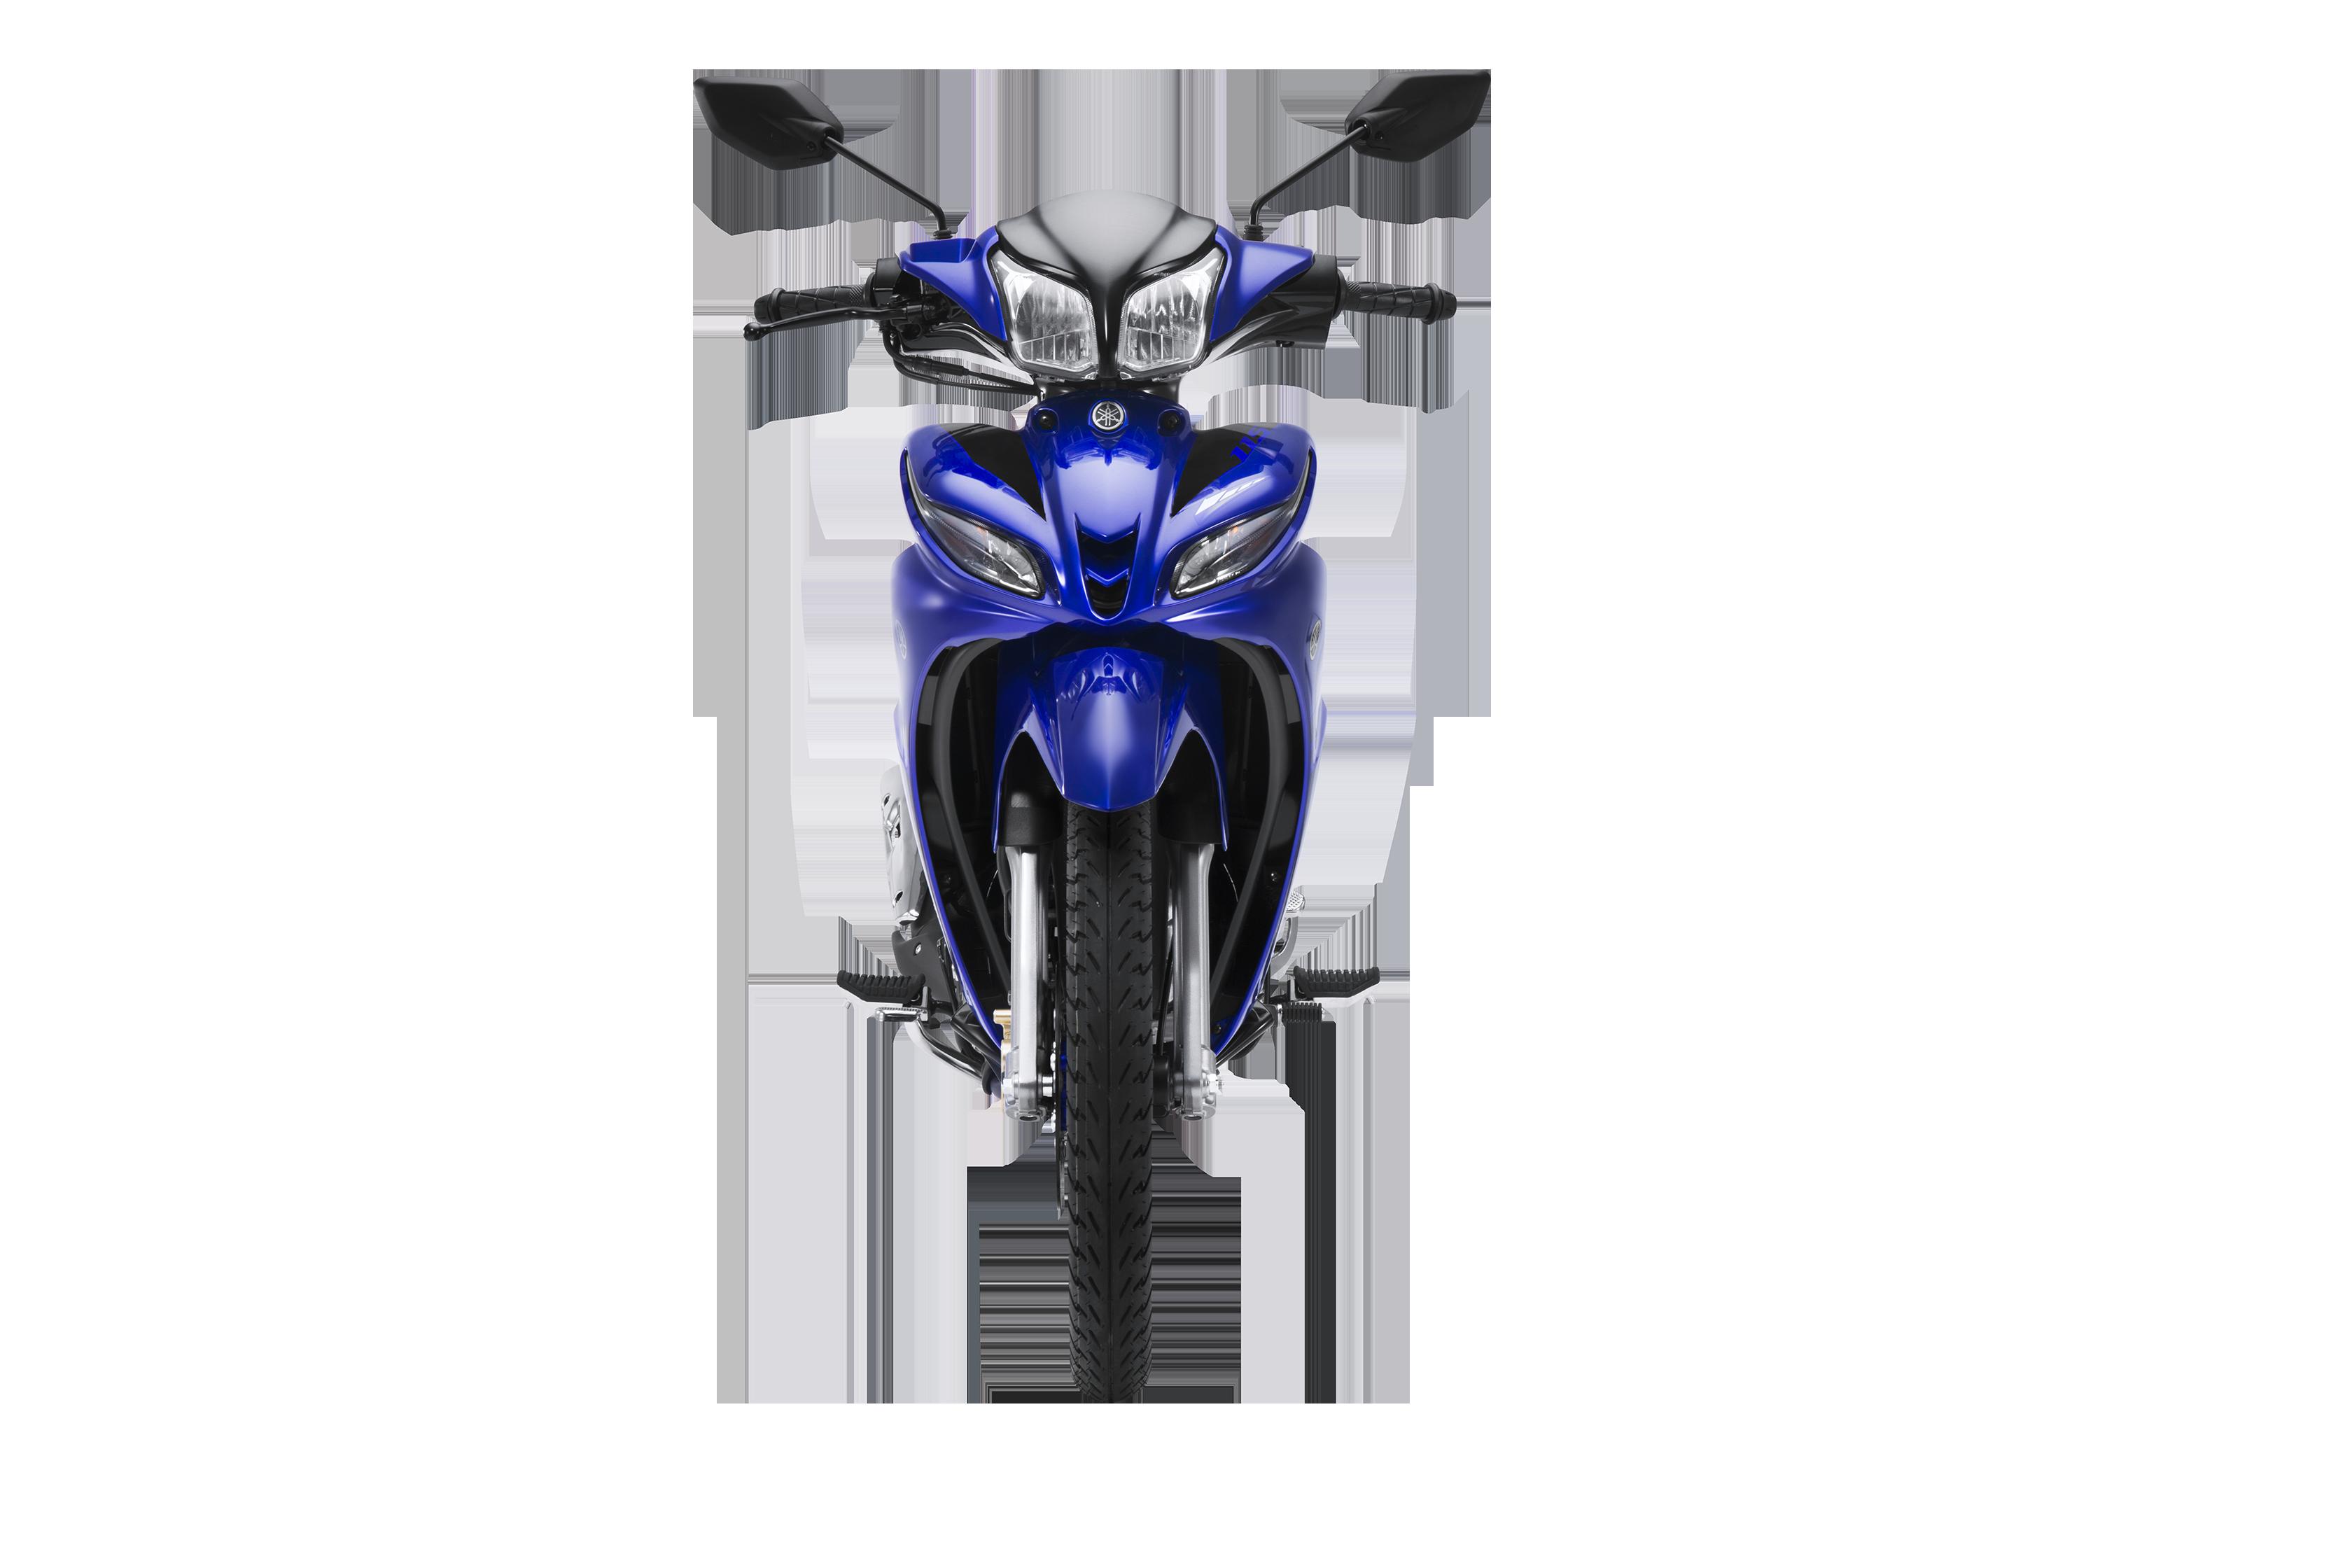 Xe Yamaha Jupiter FI GP